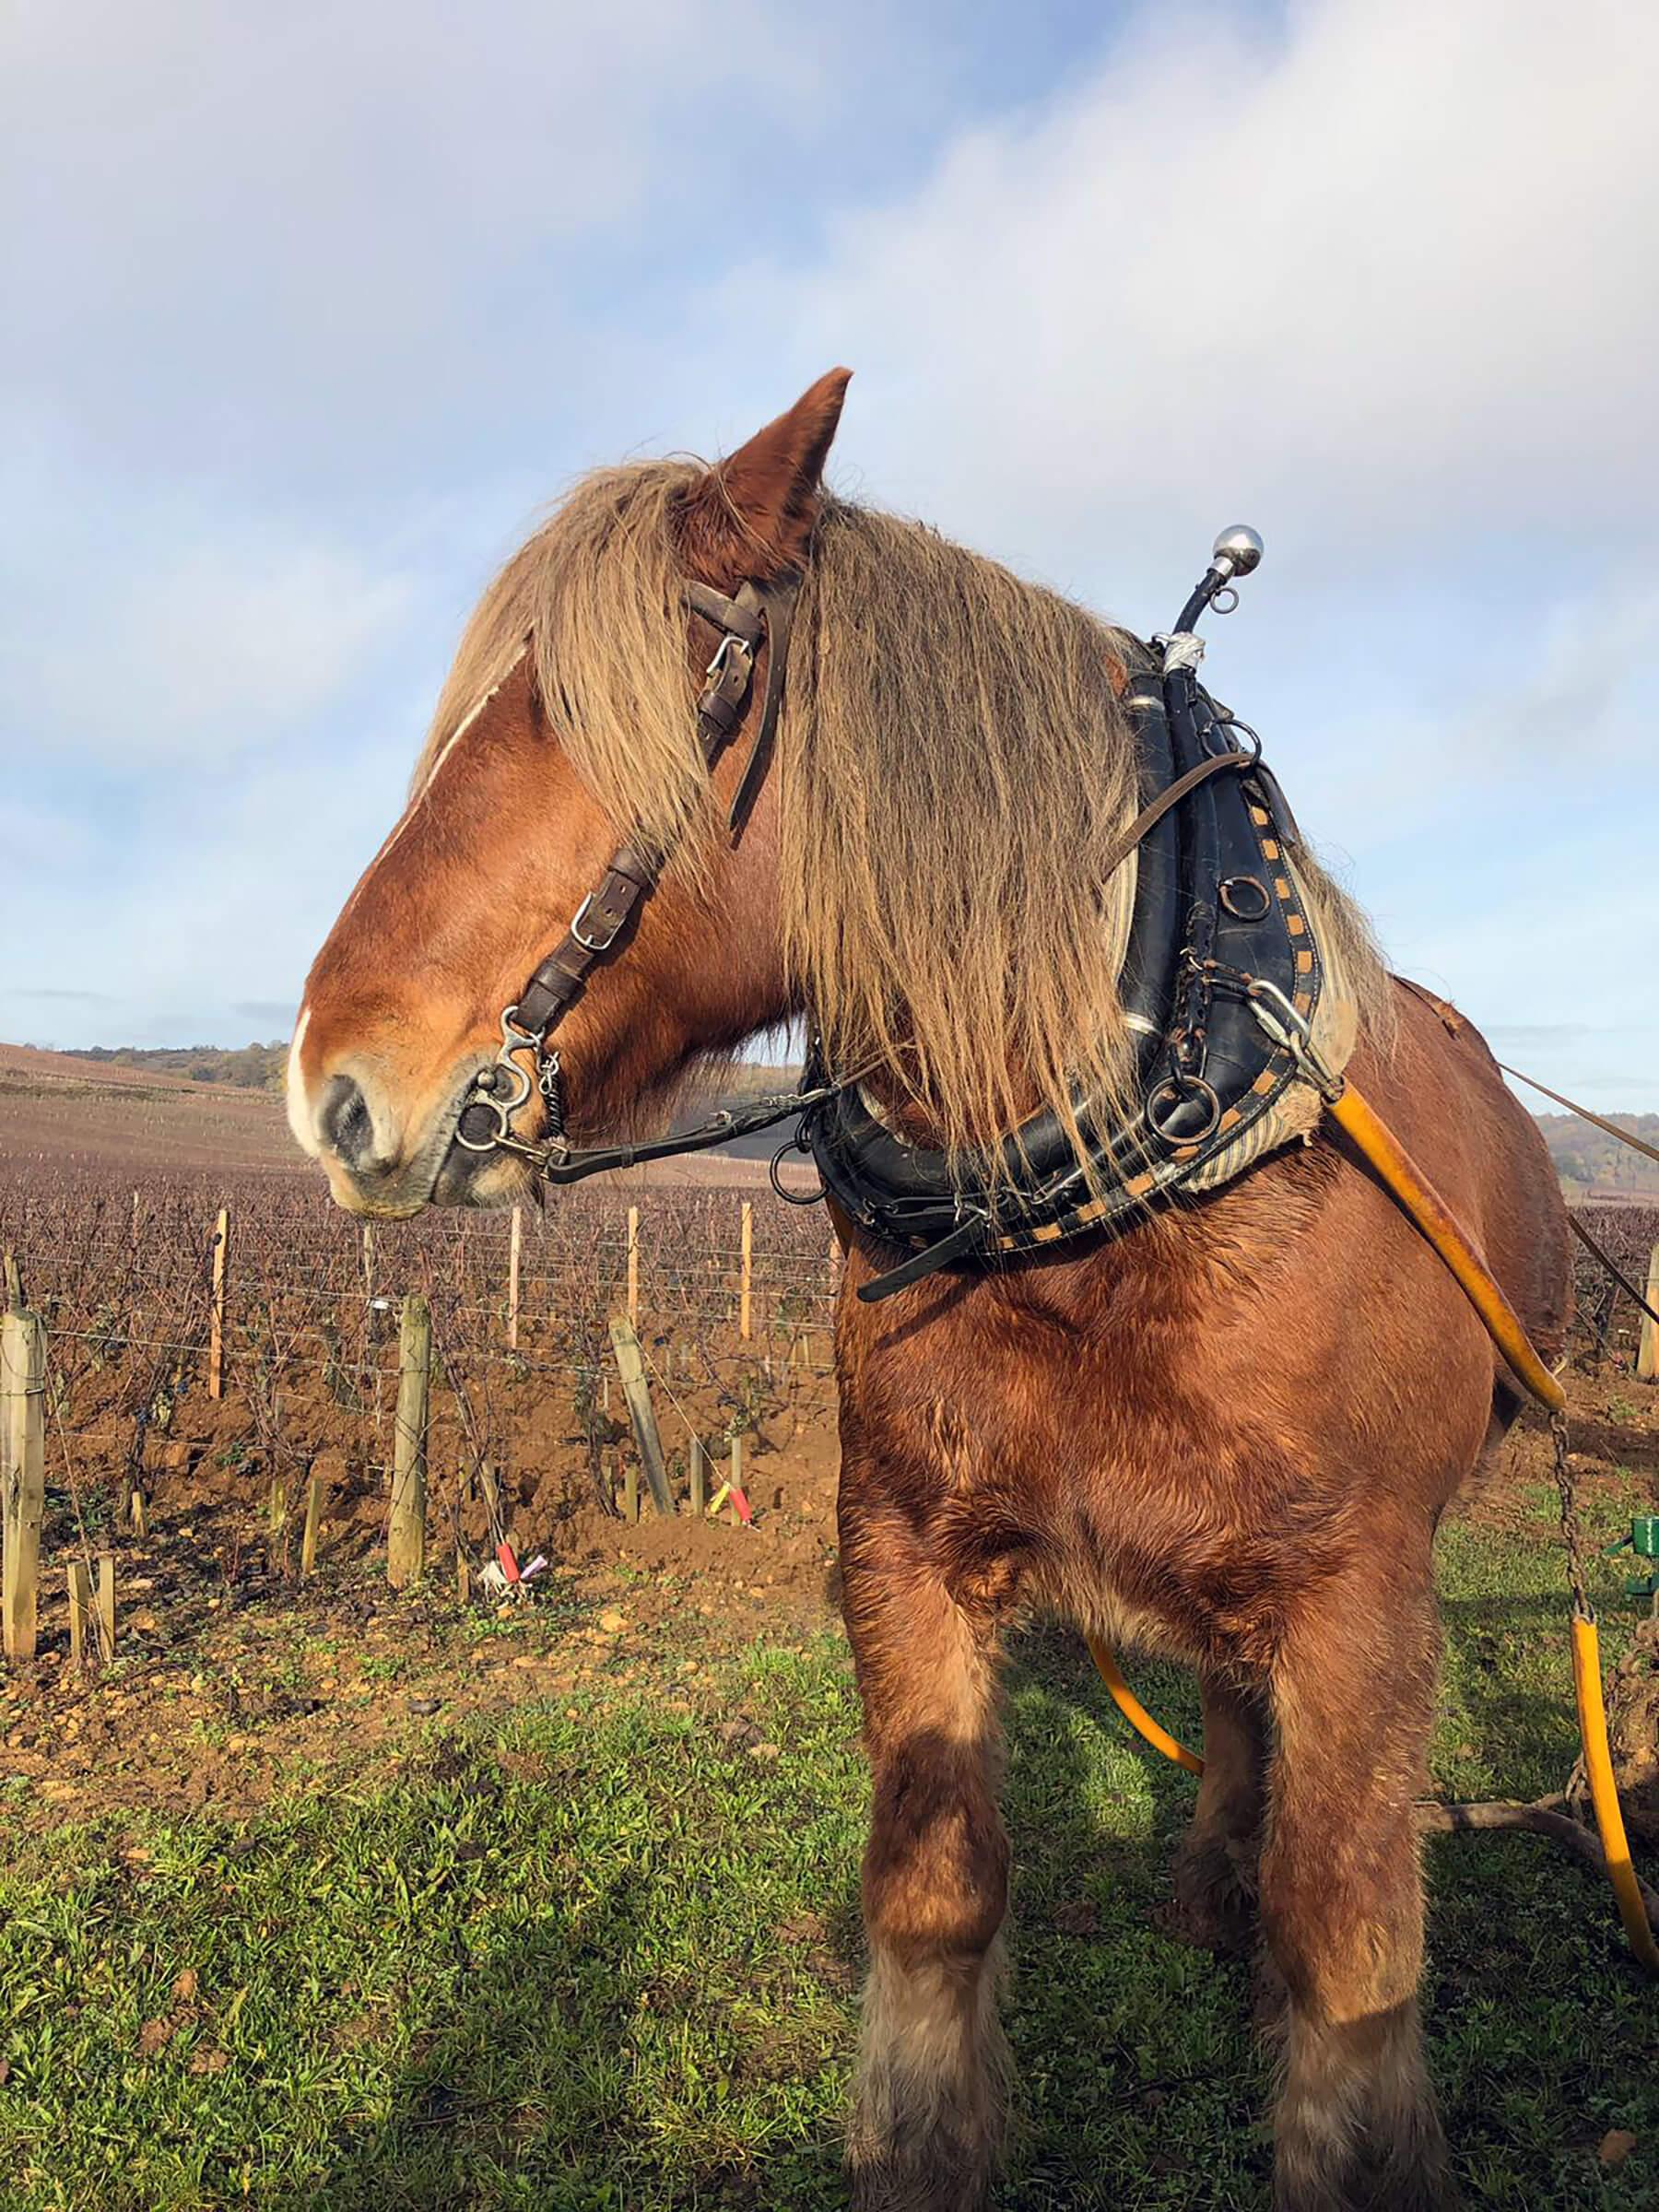 bourgogne-discovery-transport-prive-de-personne-visite-vigne-grand-domaine-viticole-bourgogne-france-franche-comte